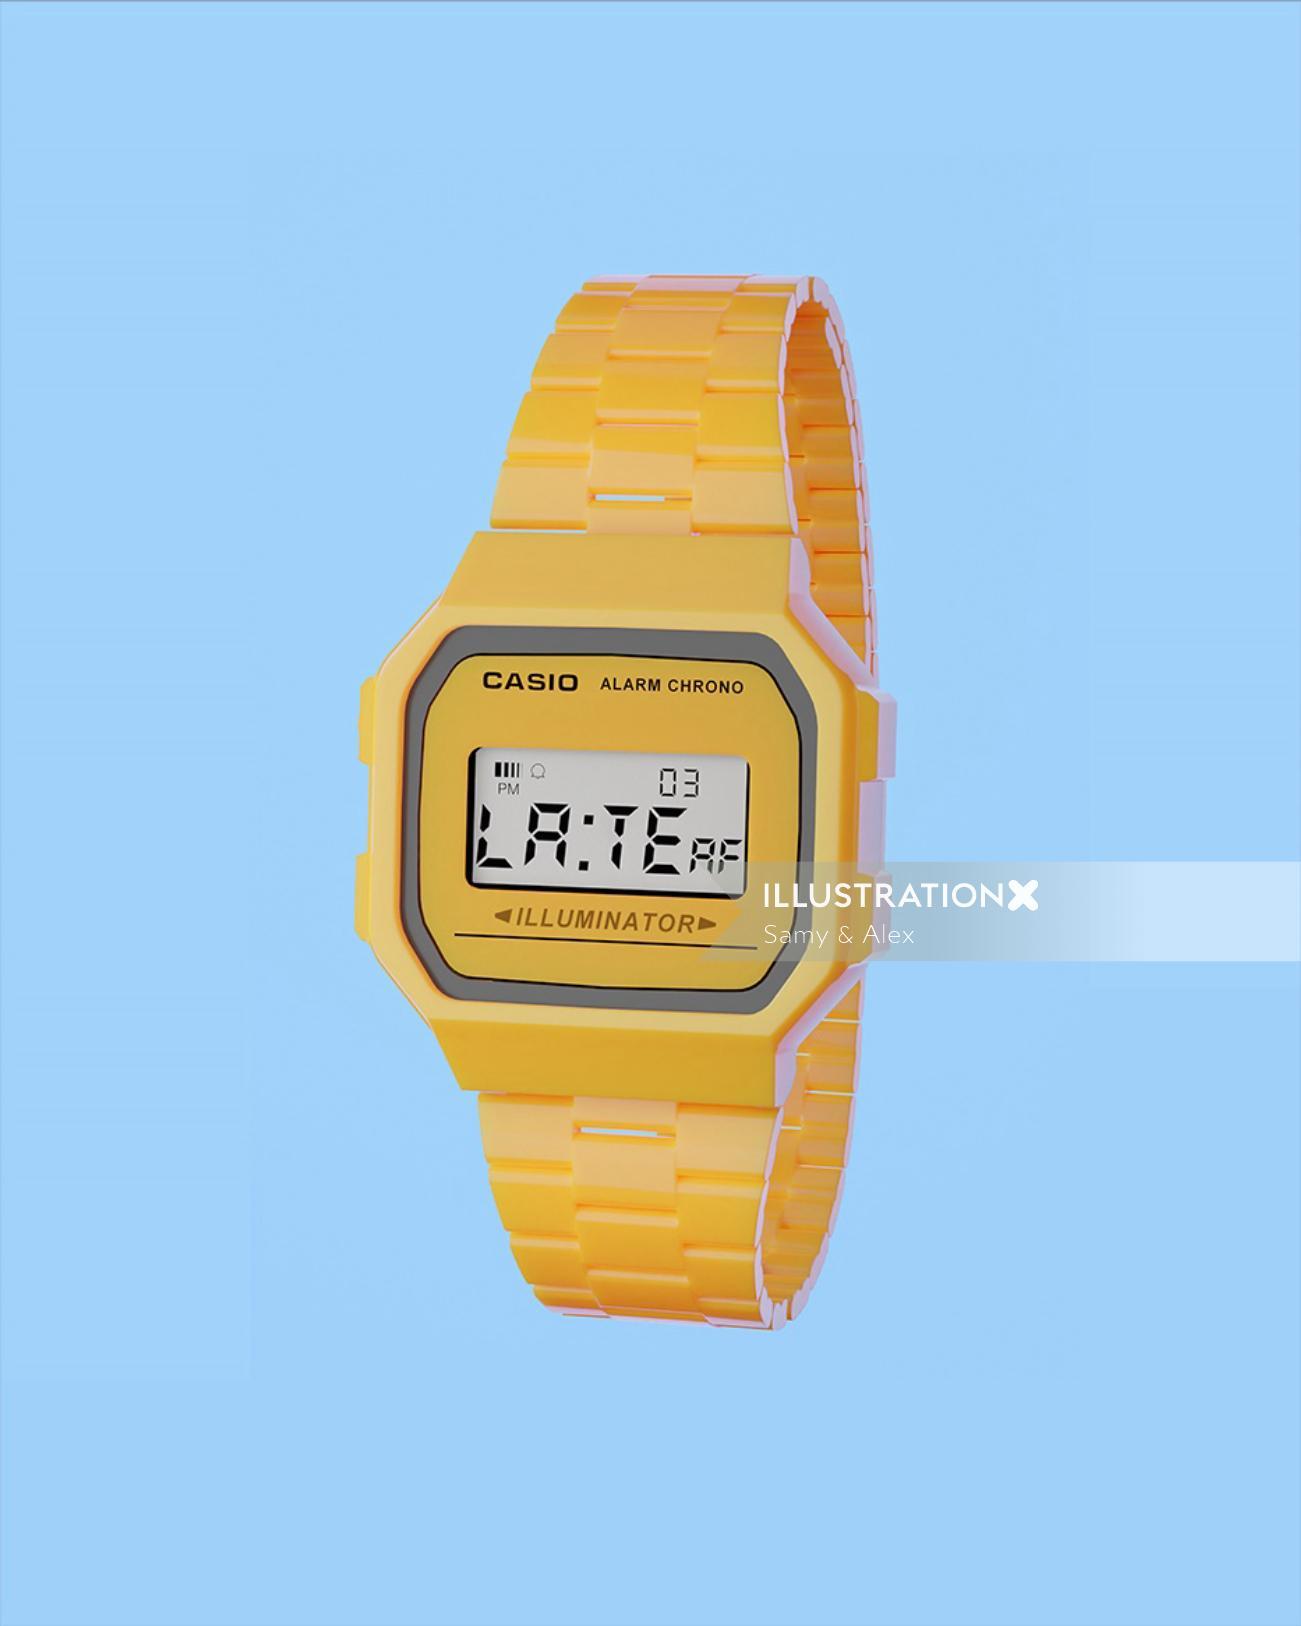 Digital painting of Casio watch